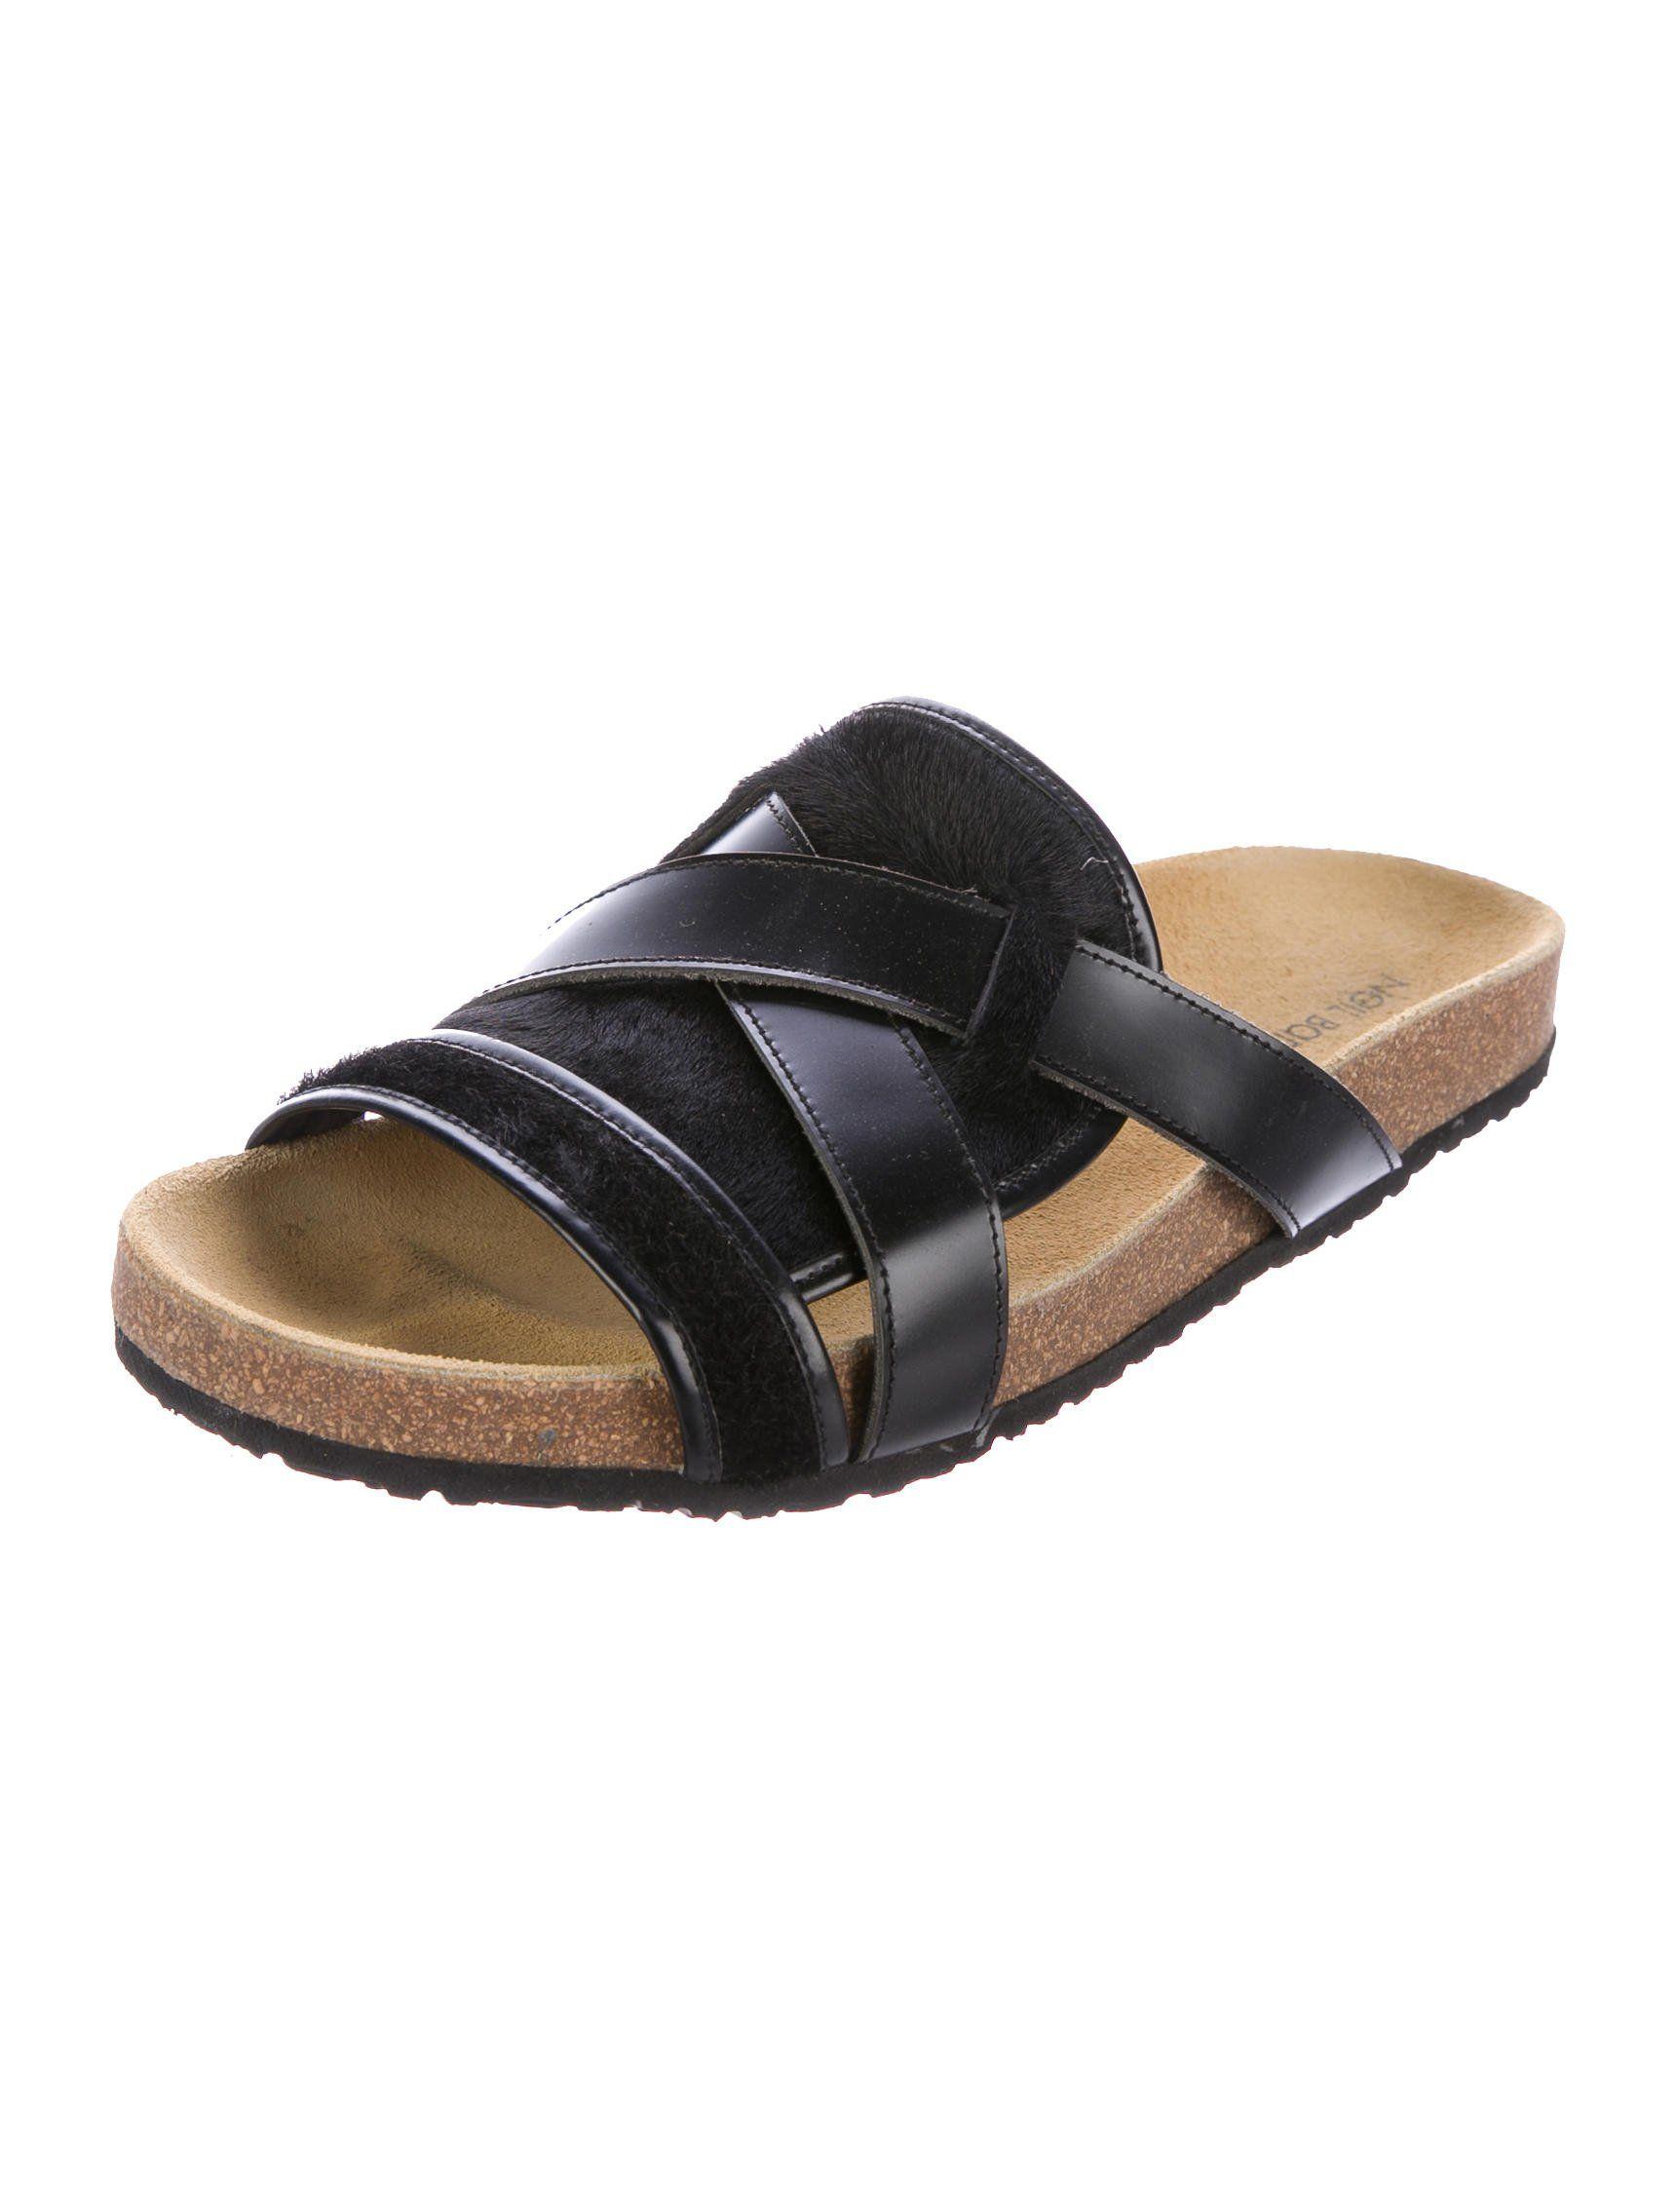 e8bdc9978af Ponyhair Slide Sandals w  Tags